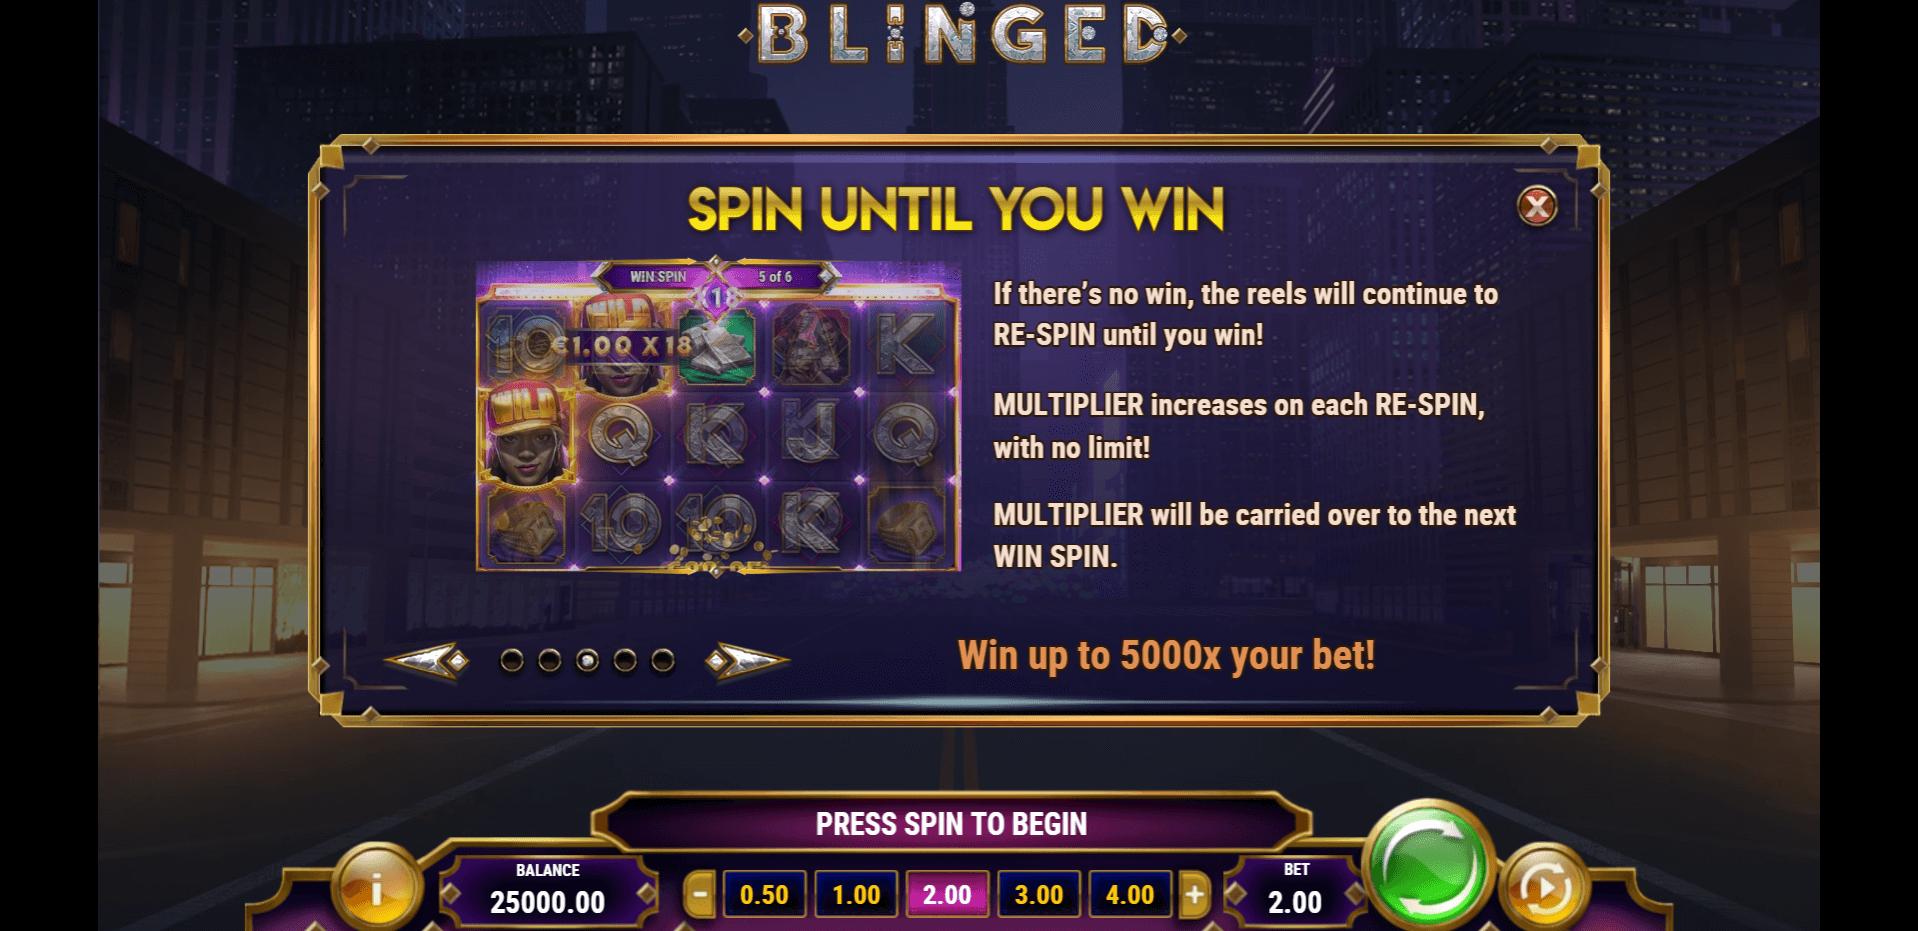 Blinged Slot Machine